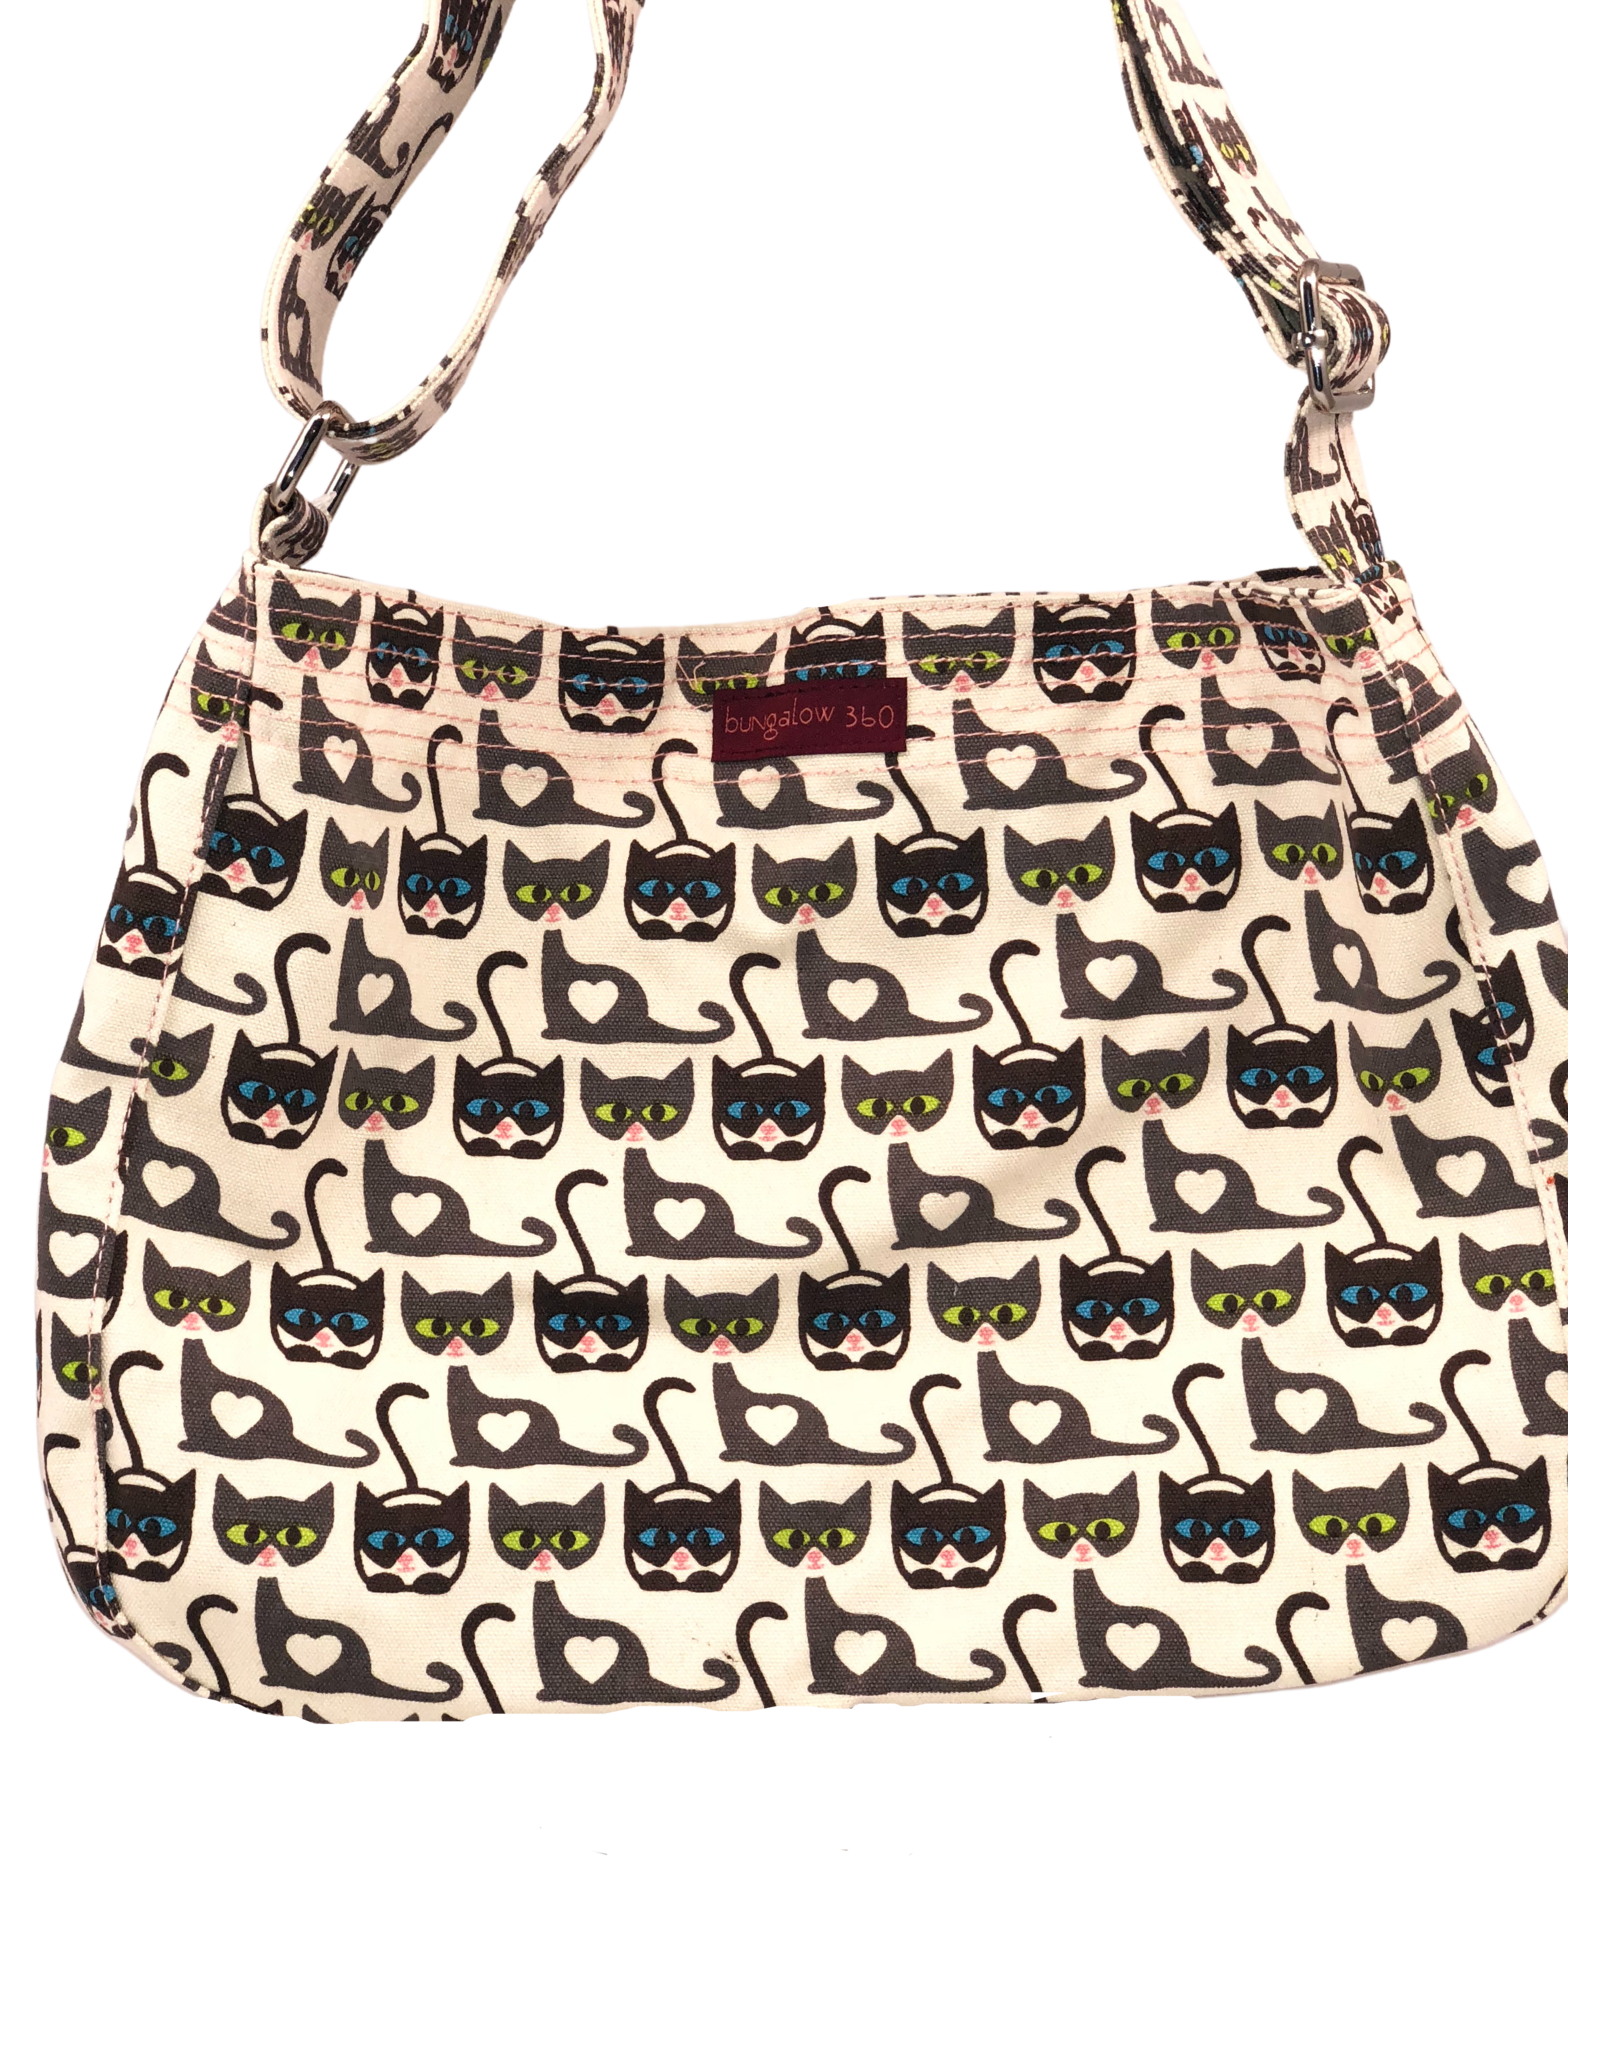 Bungalow 360 Messenger Bag Cat